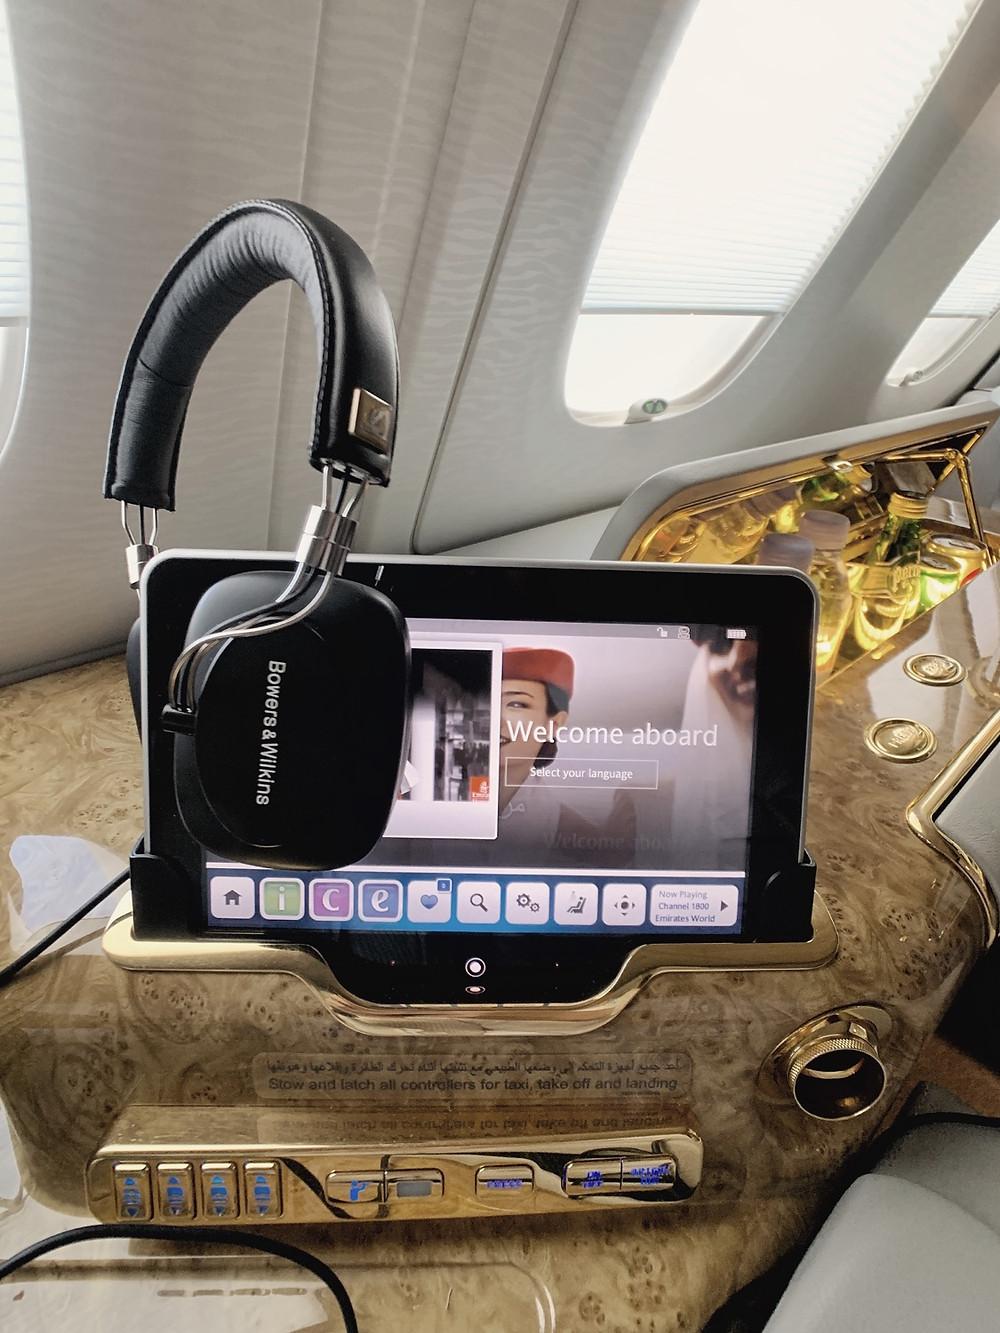 Emirates First Class San Francisco - Dubai, Inflight Entertainment System